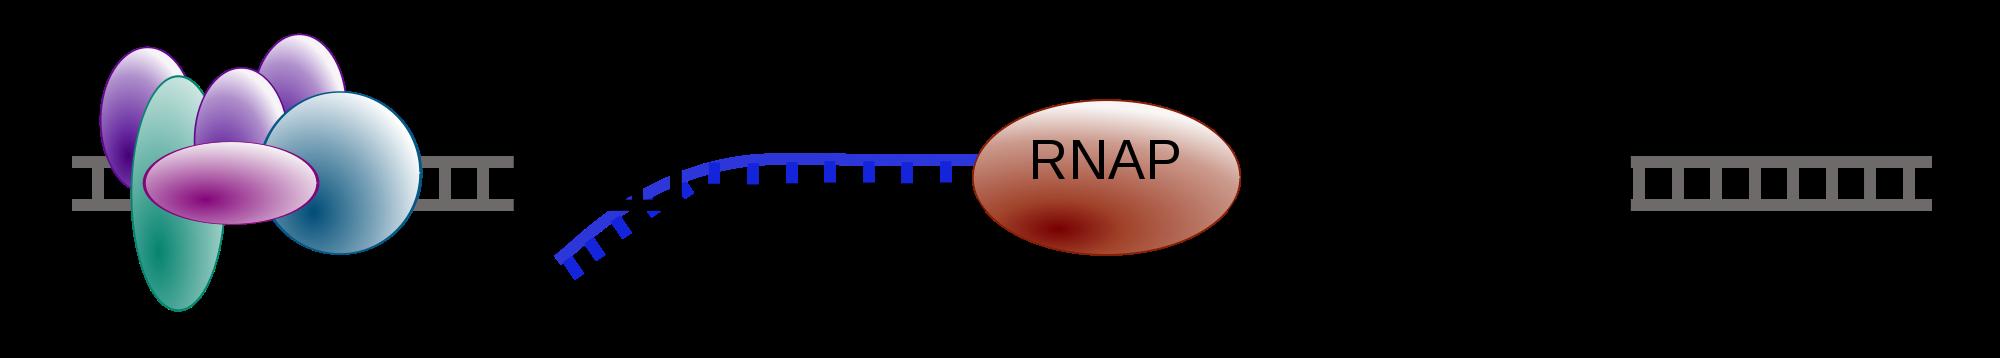 Elongation phase of transcription